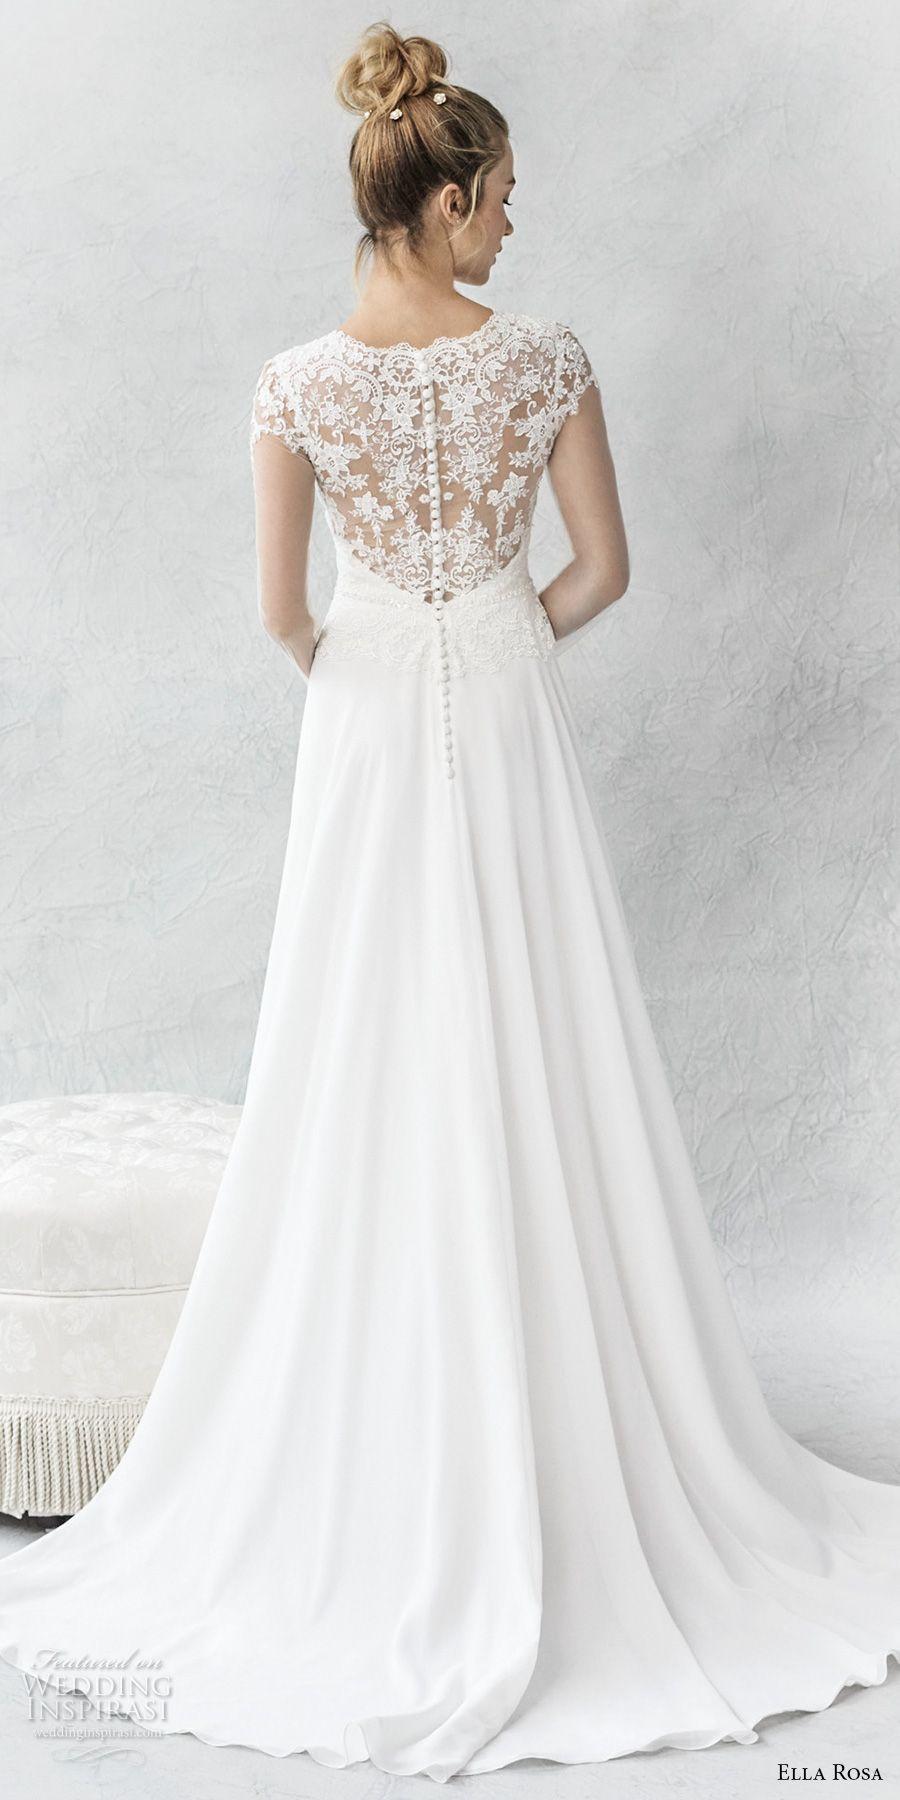 ella rosa spring 2017 bridal long sleeves illusion jewel sweetheart neckline heavily embellished bodice romantic elegant modified a  line wedding dress